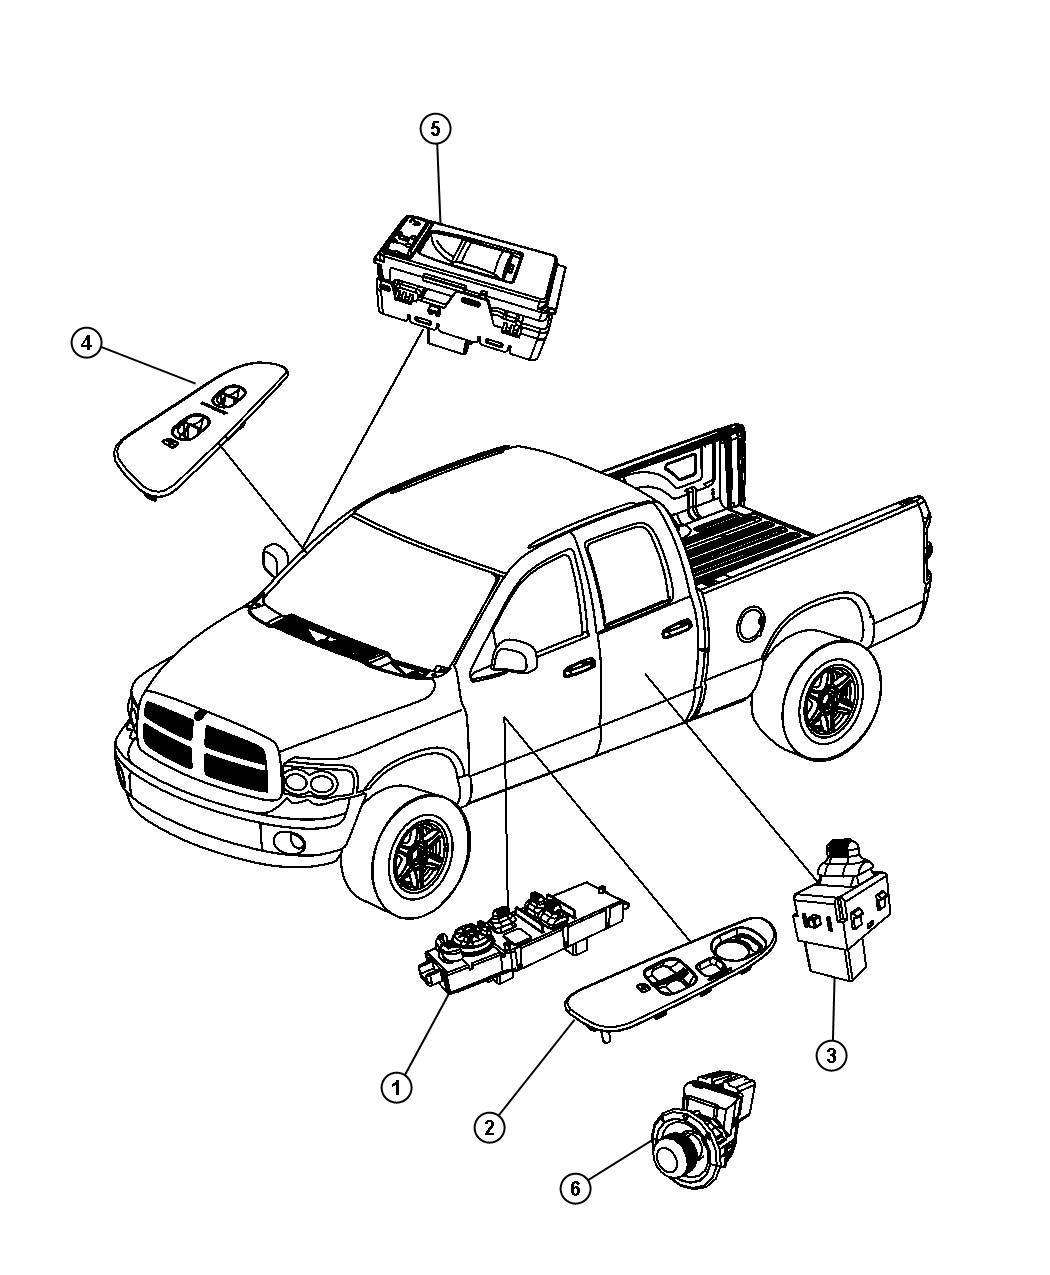 2001 Dodge Dakota Door Diagram